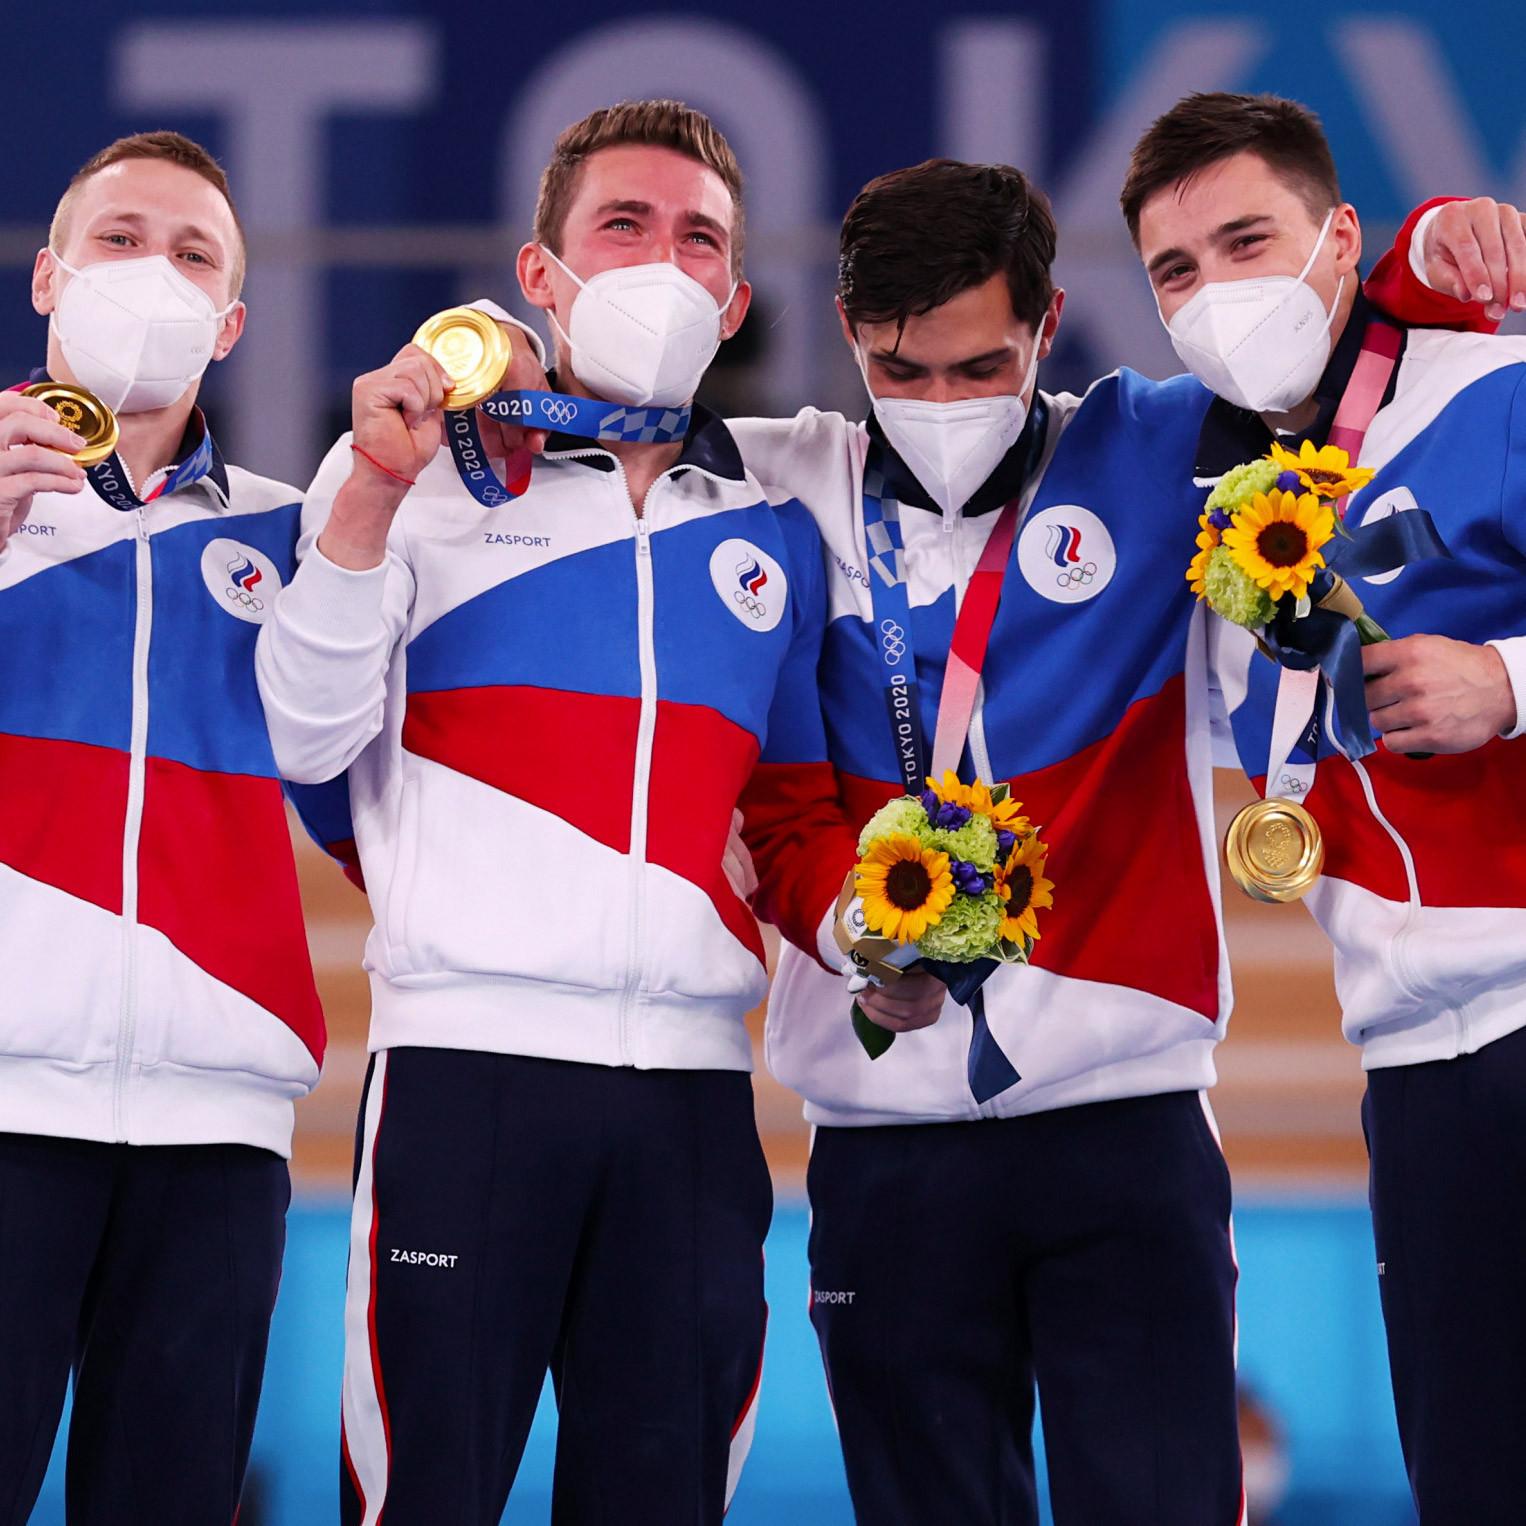 Men's artistic gymnastics team